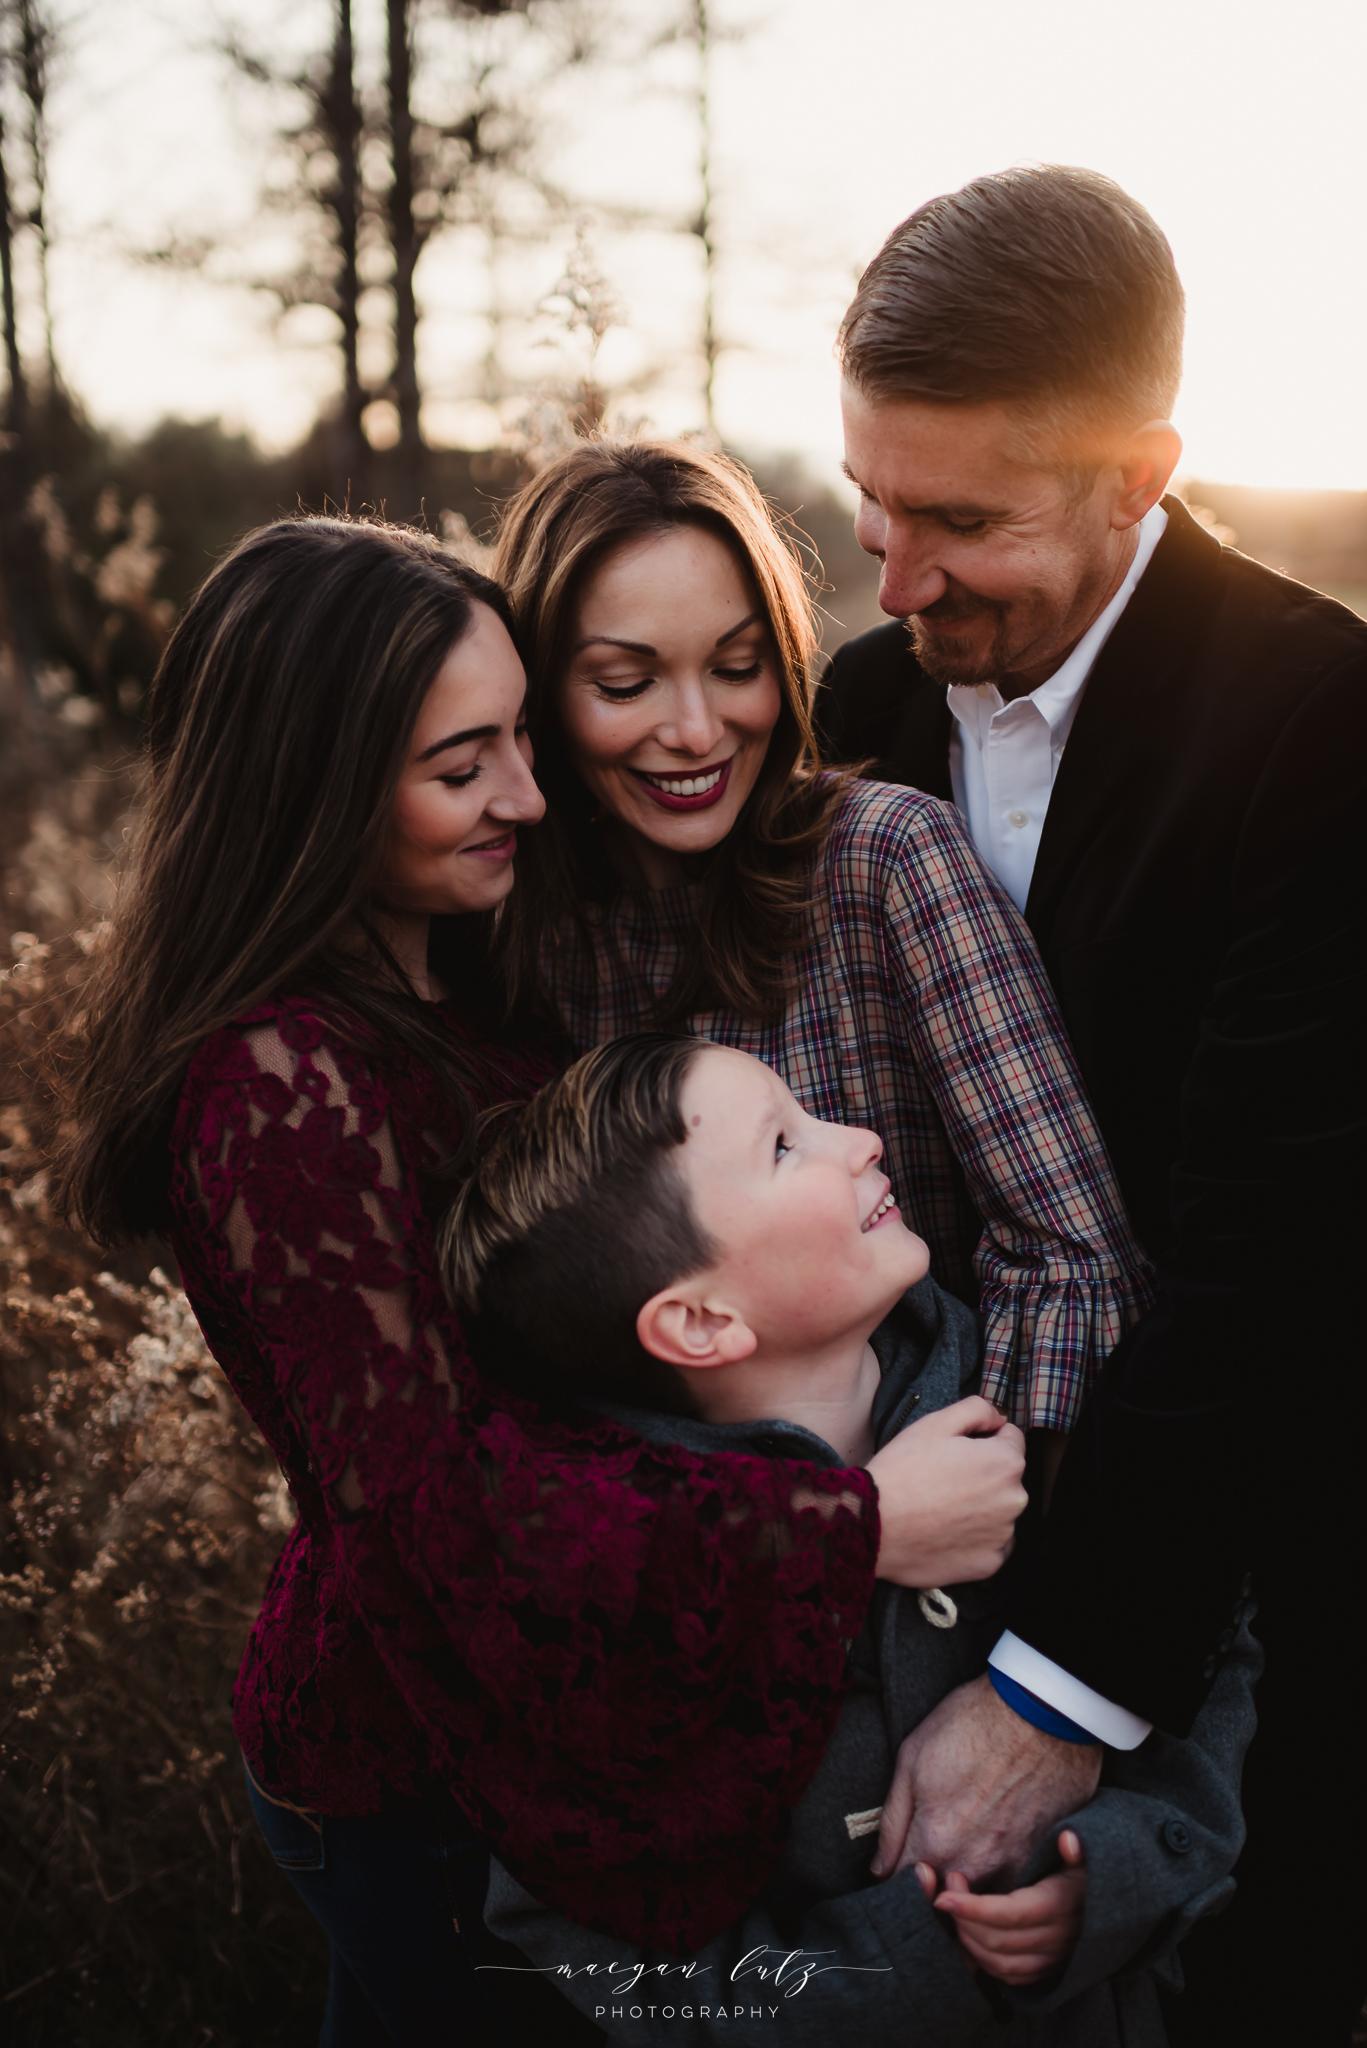 Scranton Family photographer in NEPA